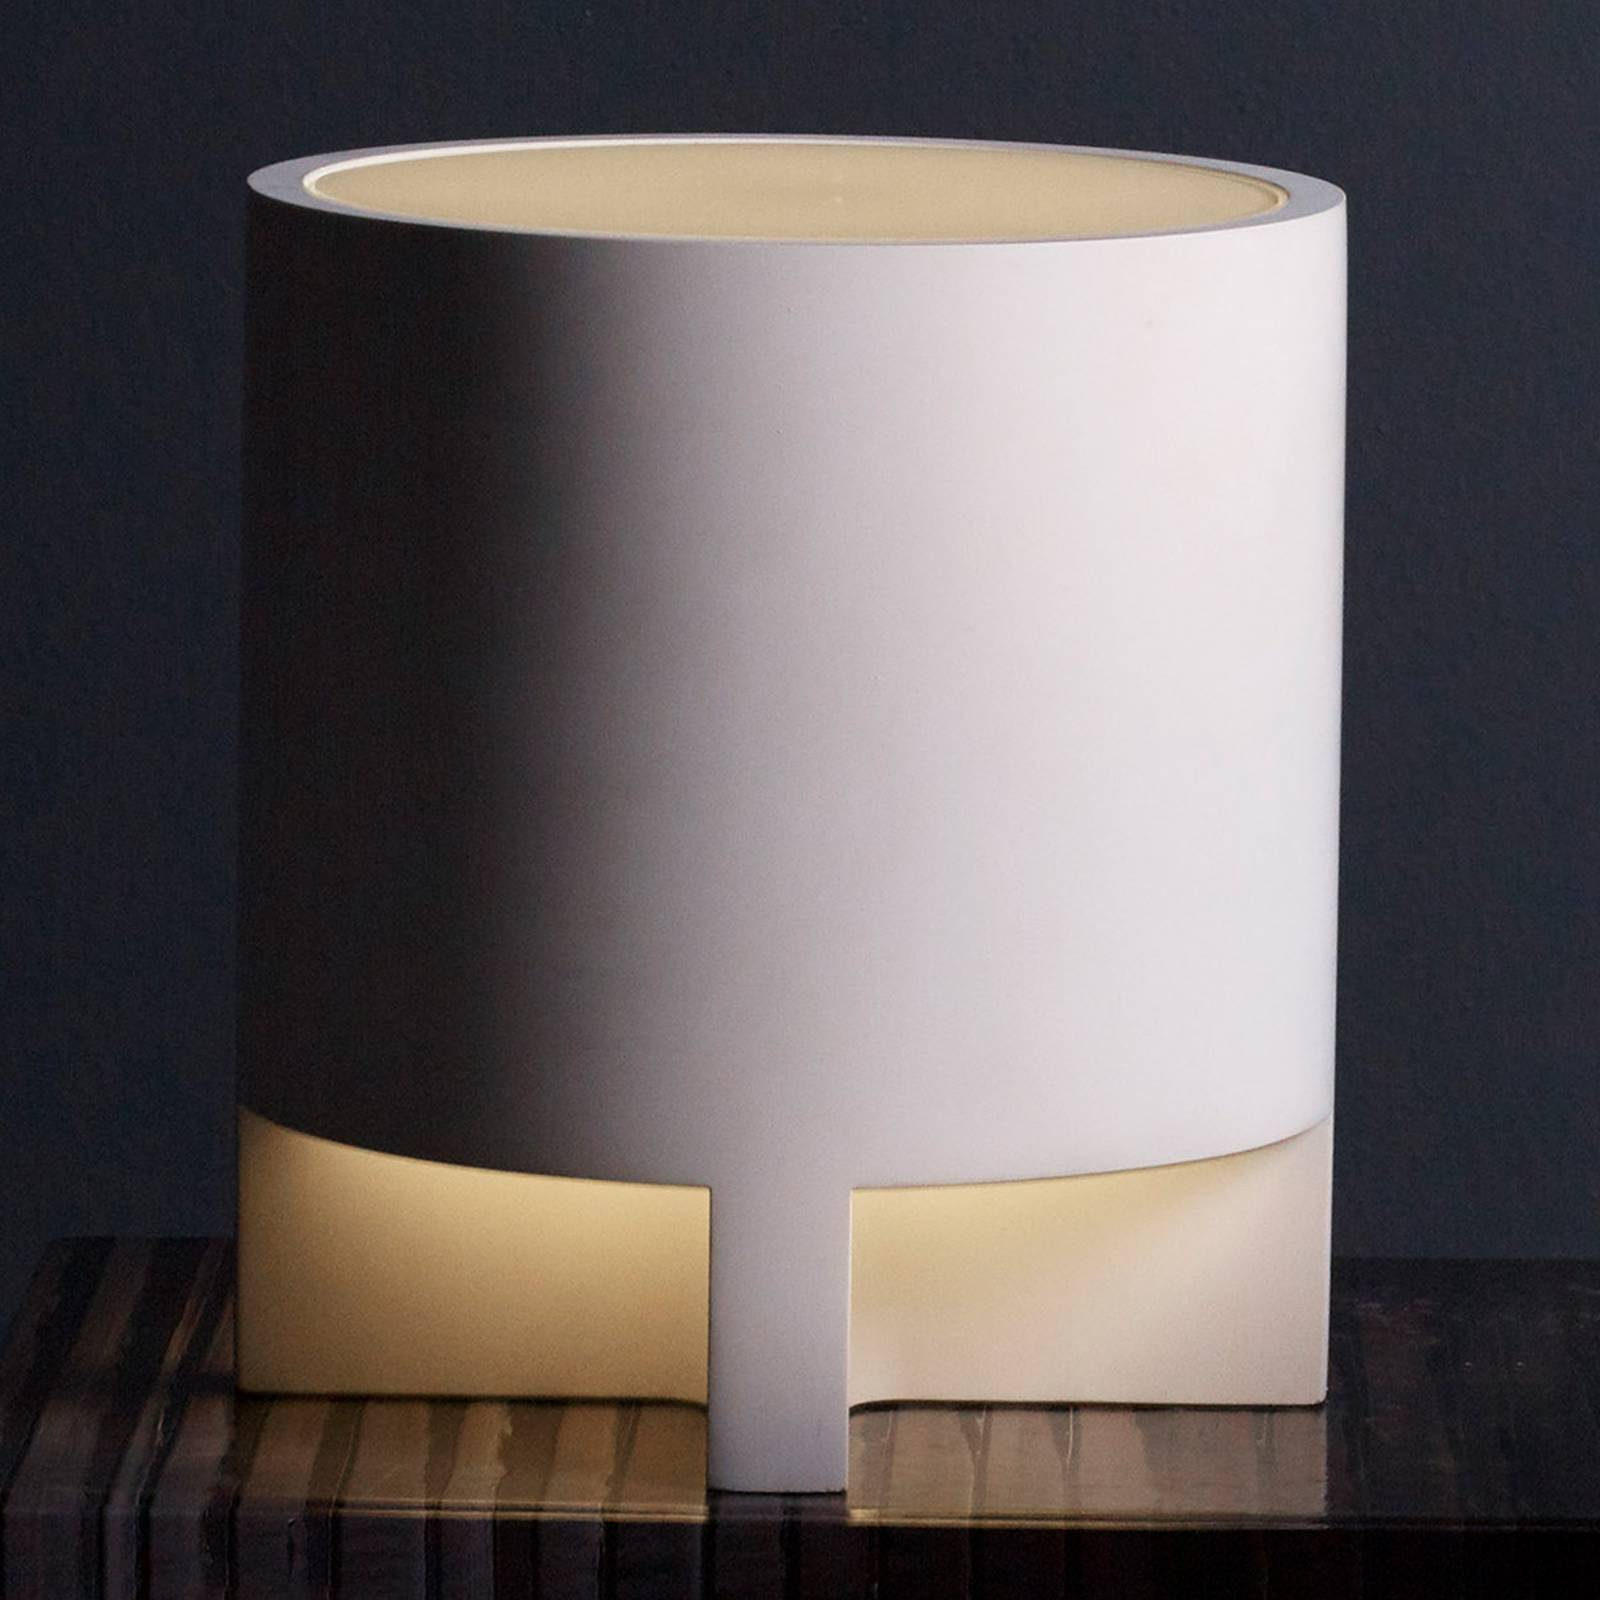 Astro Martello tafellamp Ø 18 cm